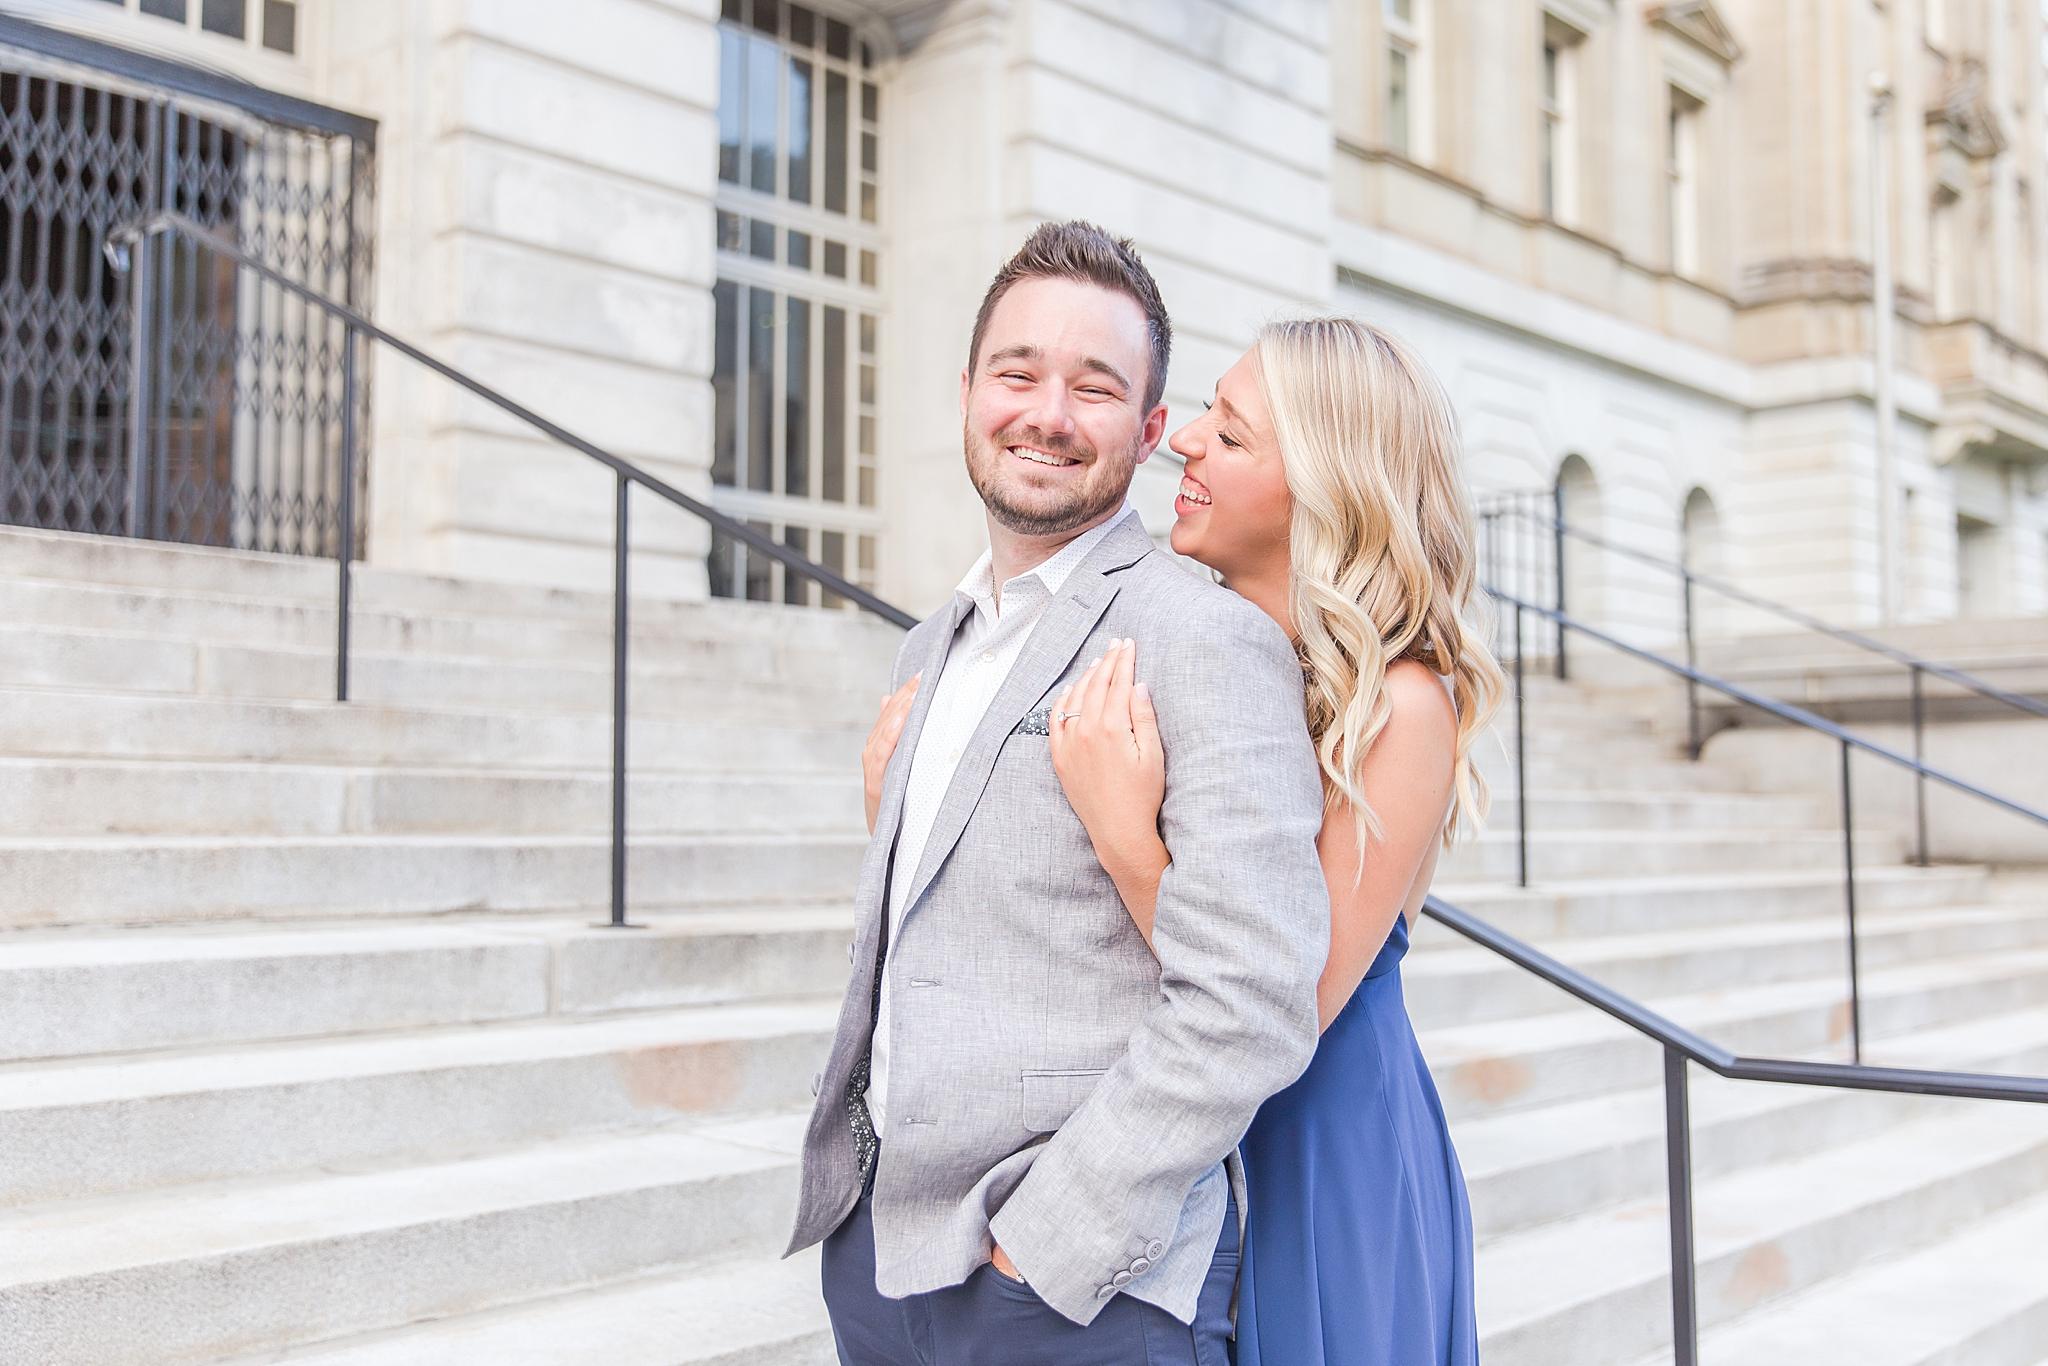 detroit-wedding-photographer-downtown-detroit-belle-isle-engagement-photos-sarah-eric-by-courtney-carolyn-photography_0032.jpg